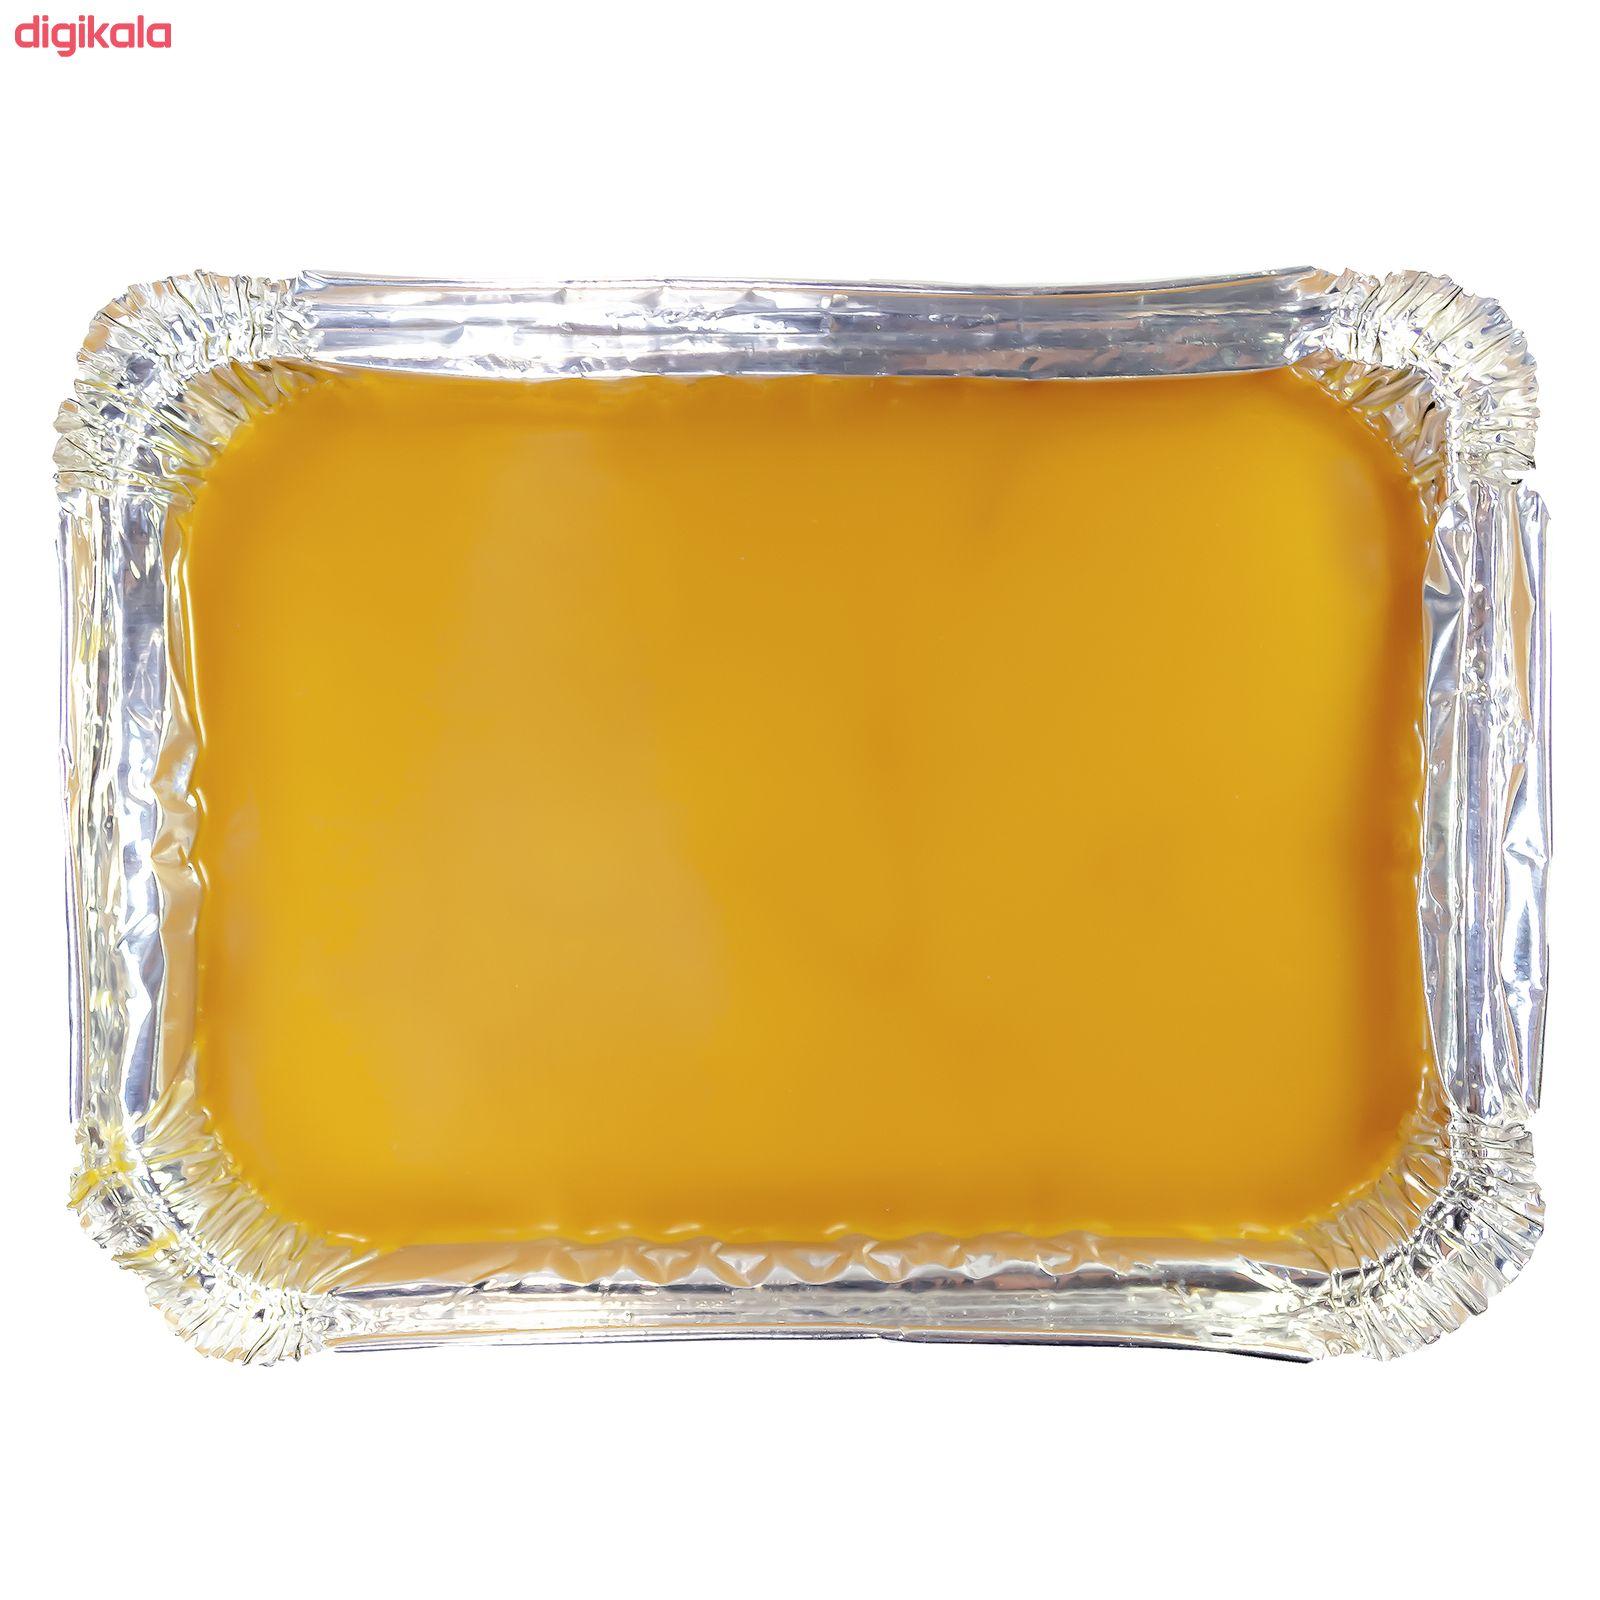 وکس موبر لفو مدل عسل وزن 500 گرم main 1 3